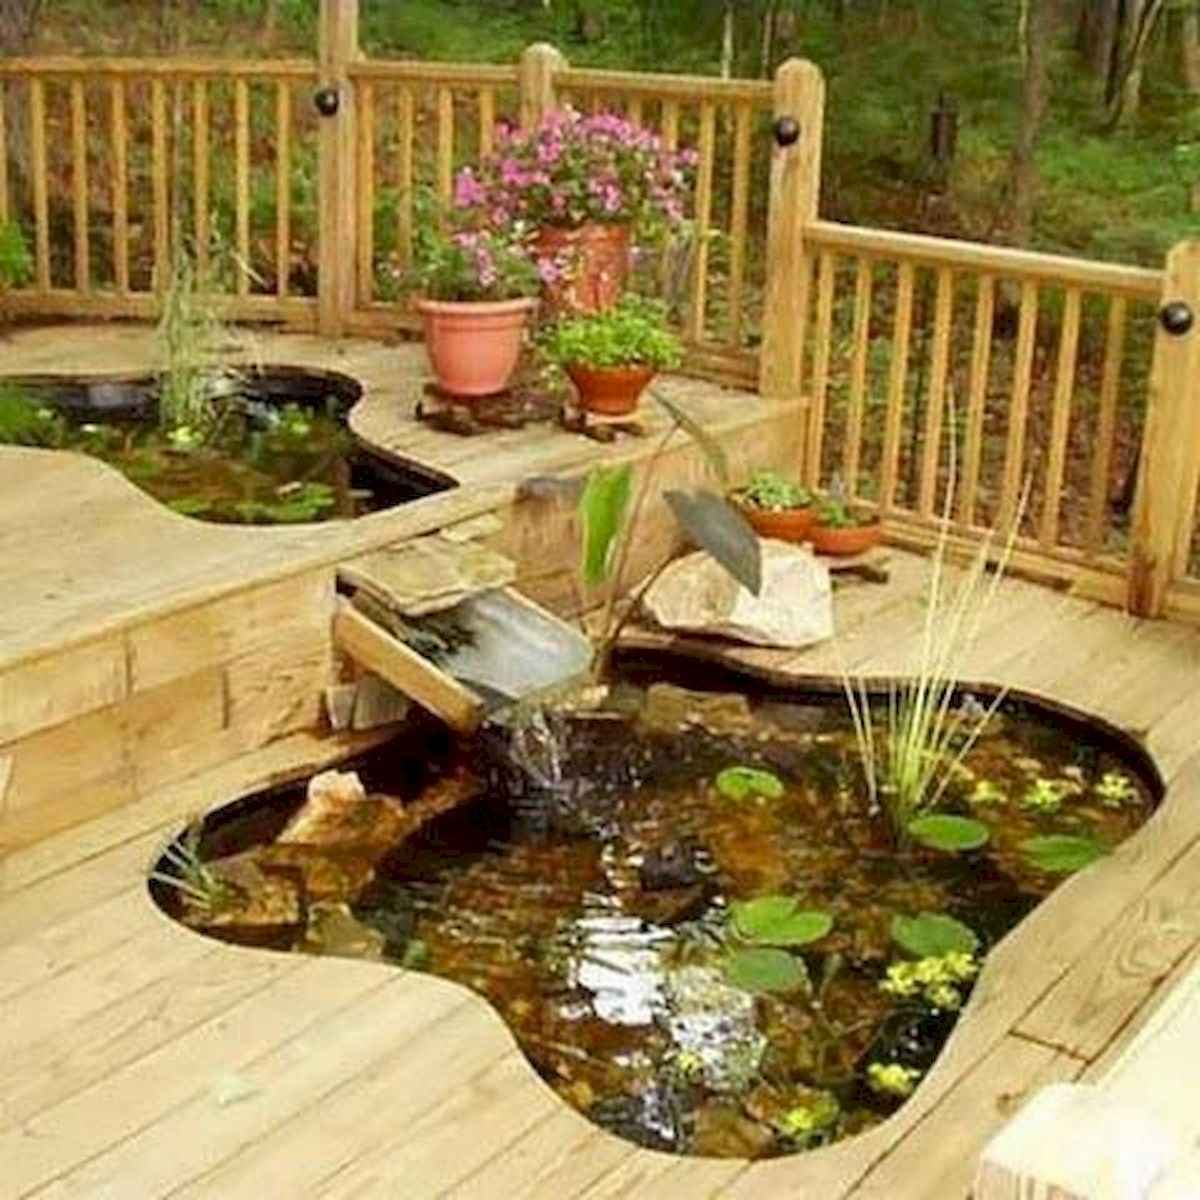 25 Stunning Backyard Ponds Ideas With Waterfalls (23)